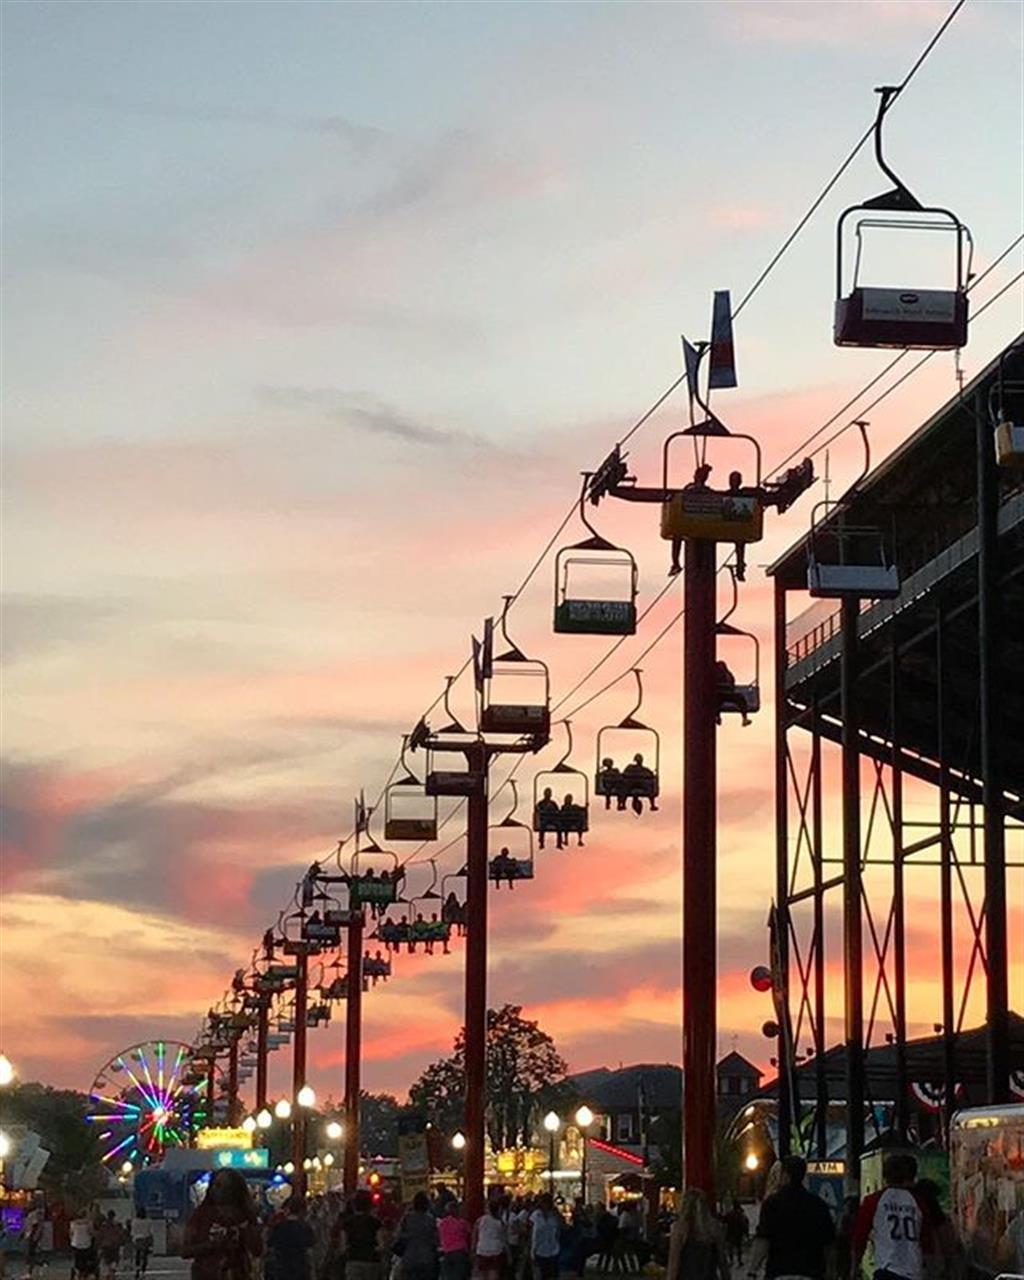 Dusk at the fairgrounds #indianastatefair #skyride #carpentercares #LeadingRELocal